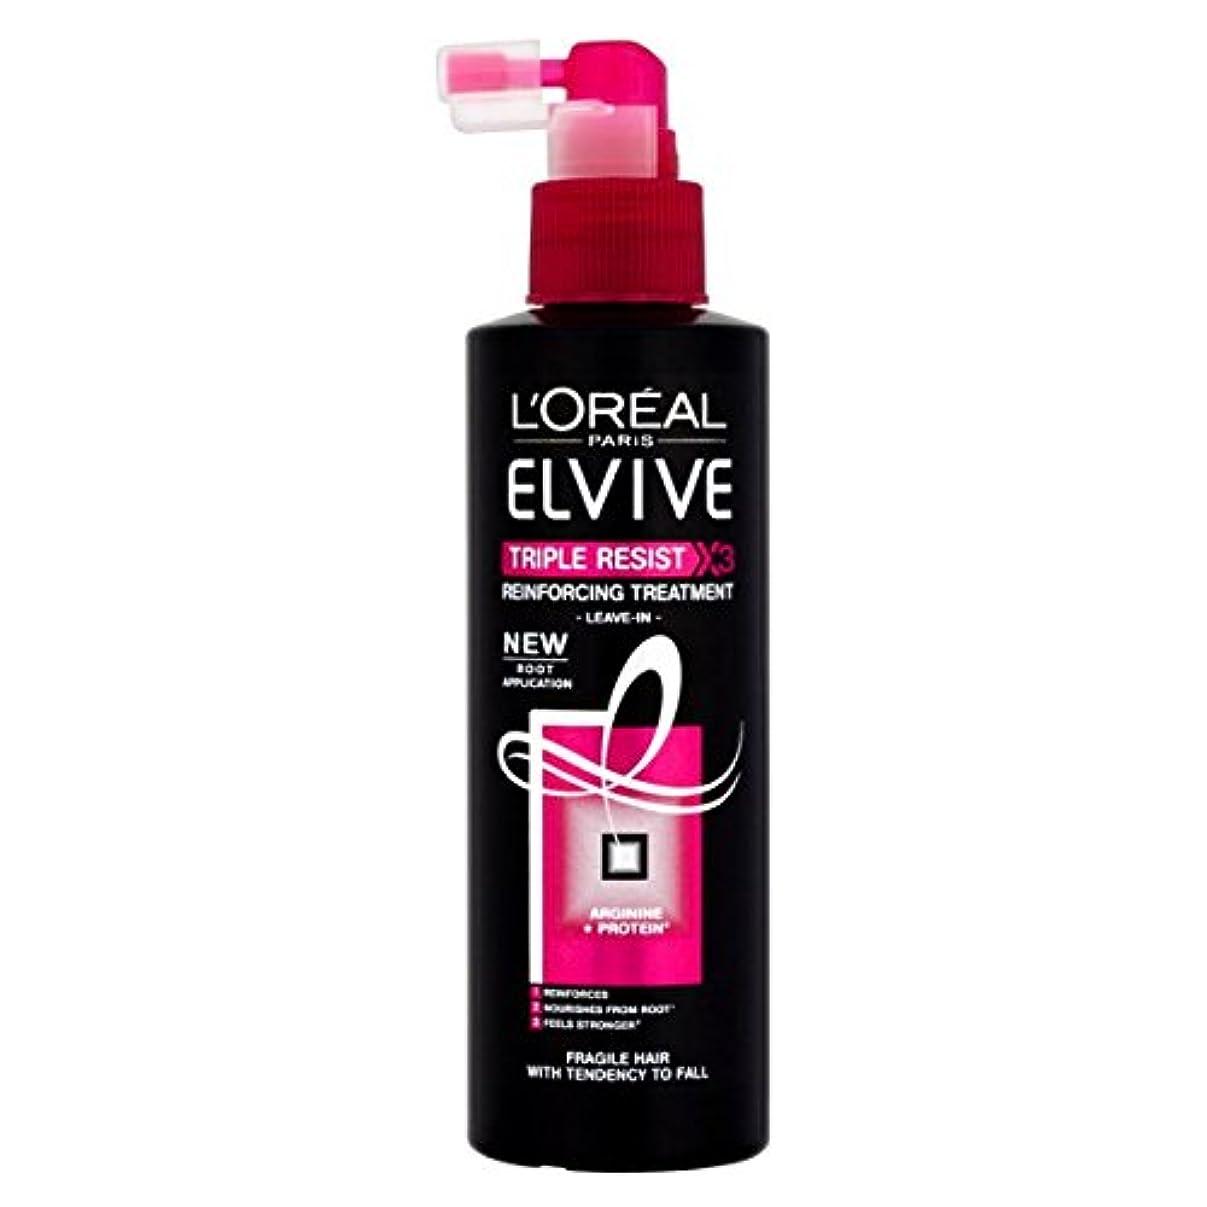 思い出す簿記係発掘するL 'Oréal Paris Elvive Triple Resist Leave-In verstärkendem Treatment 200 ml